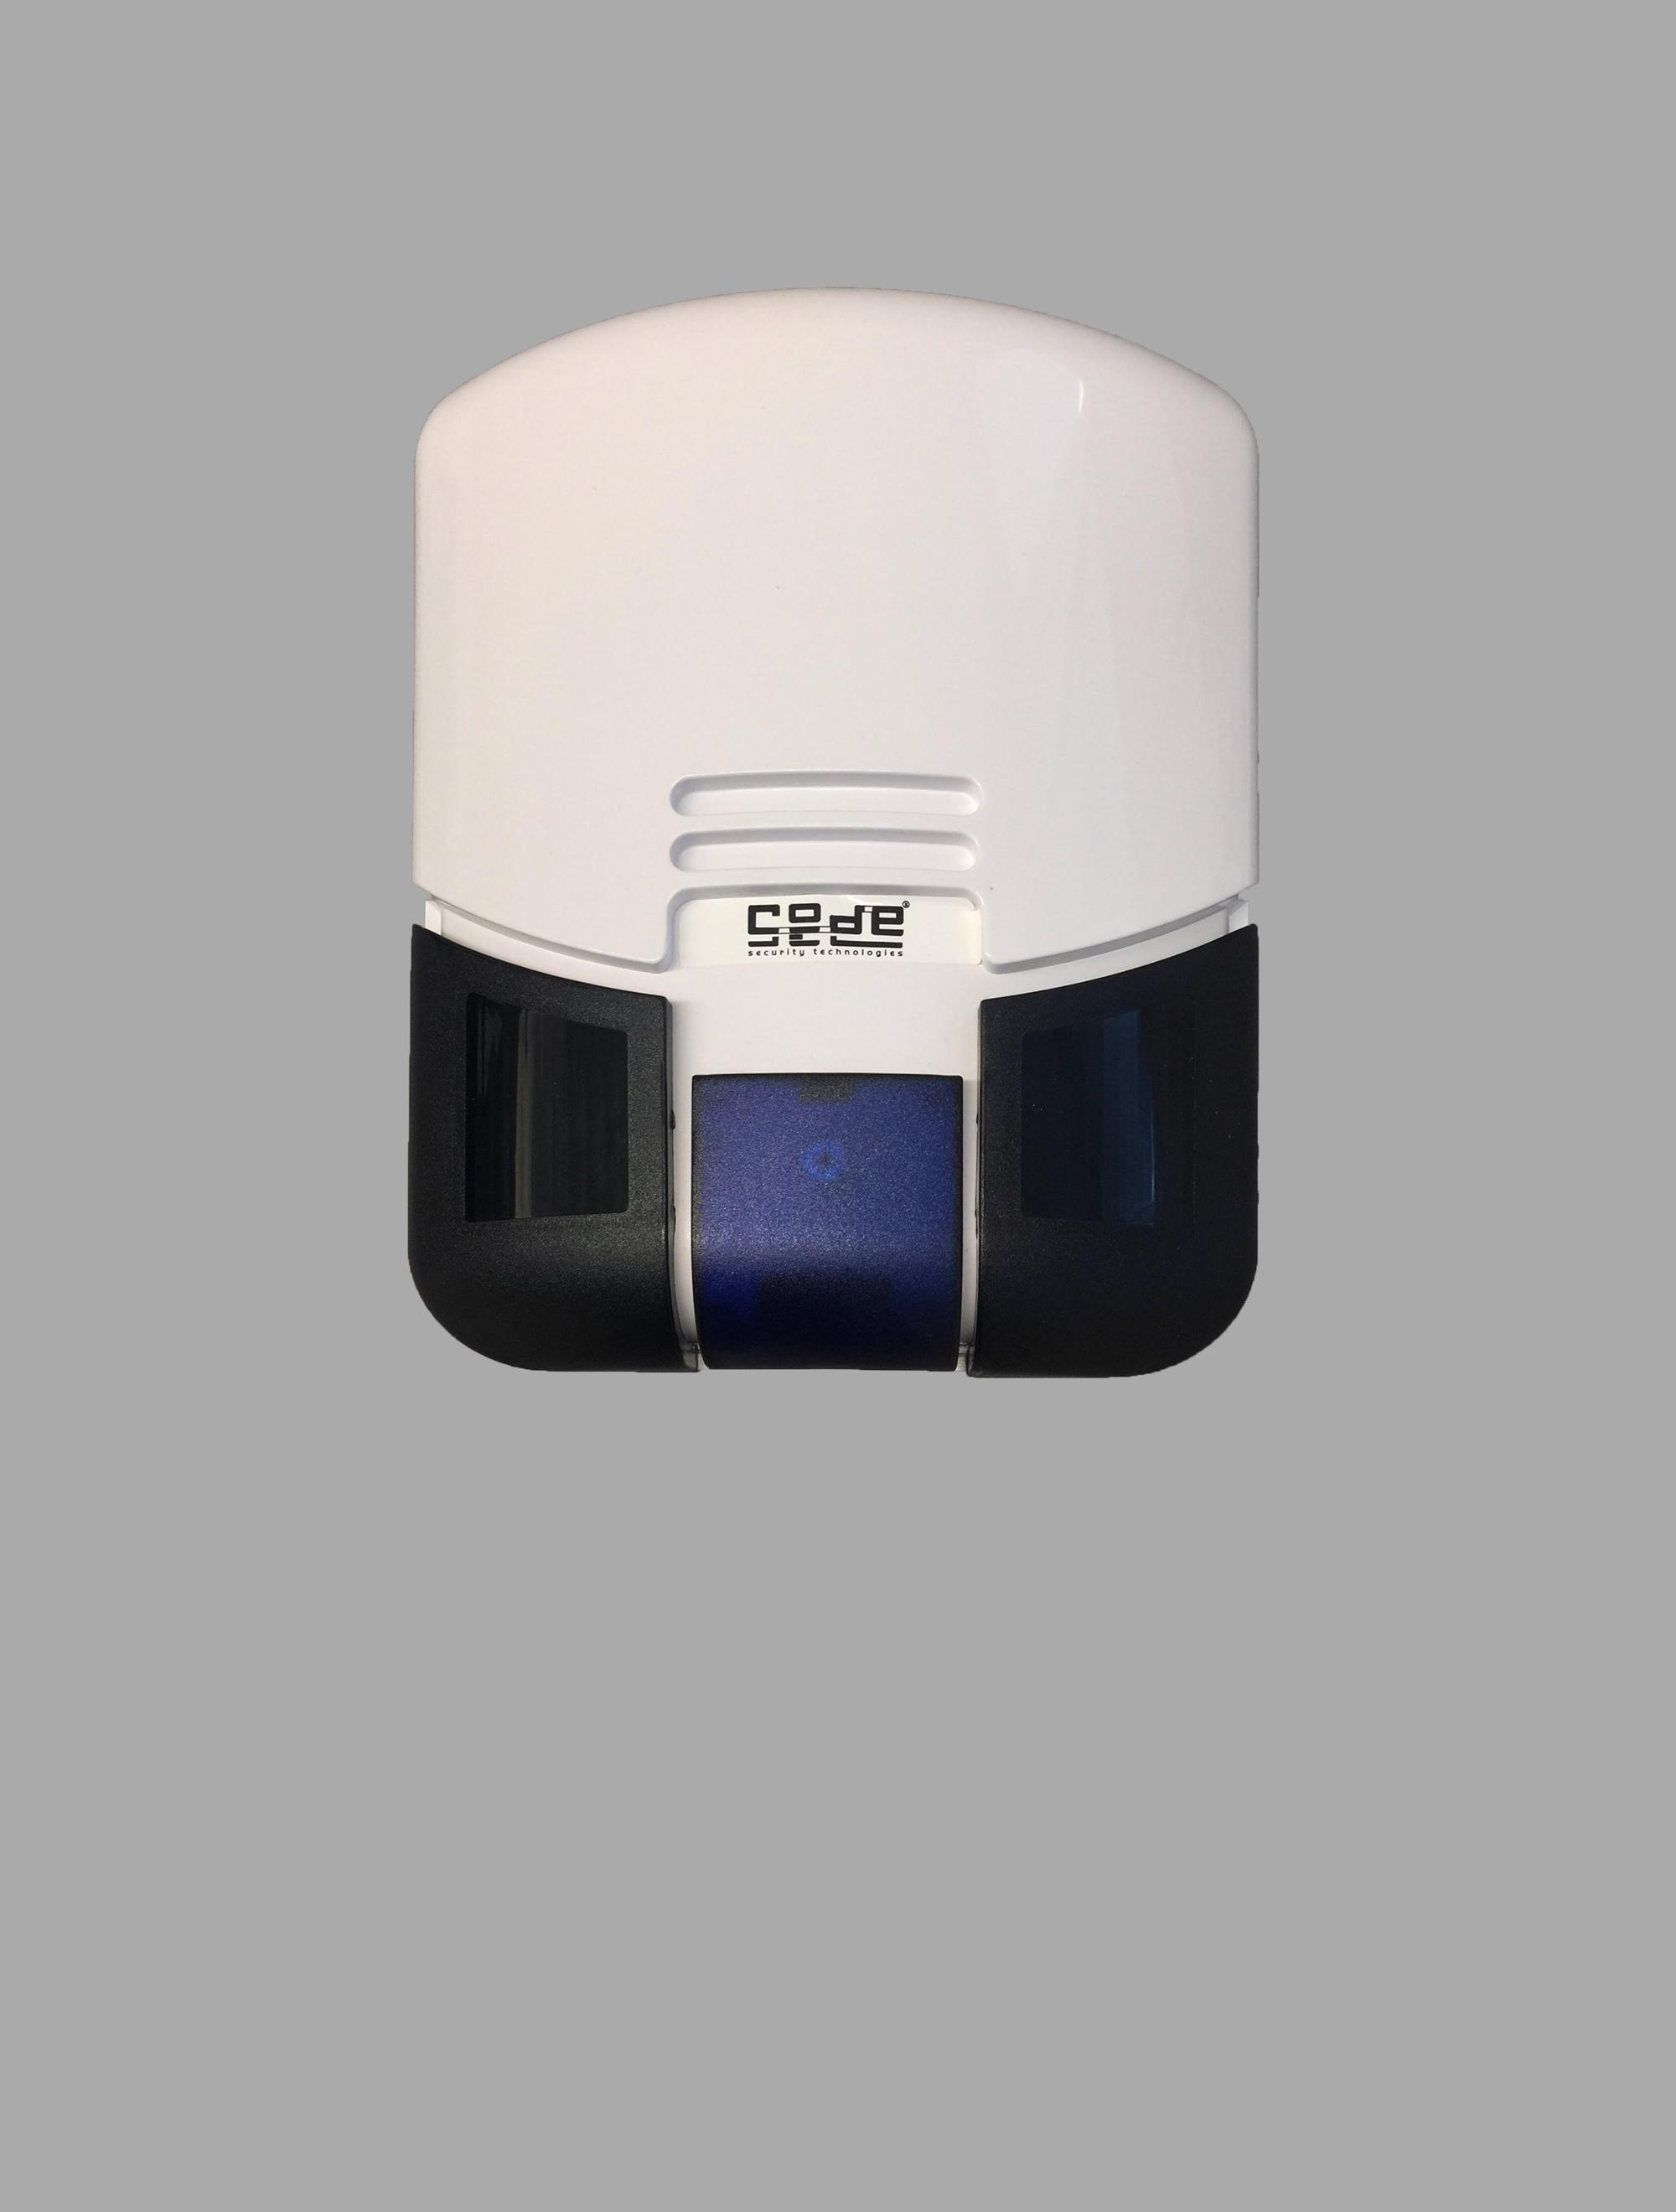 Burglary Alarm Systems